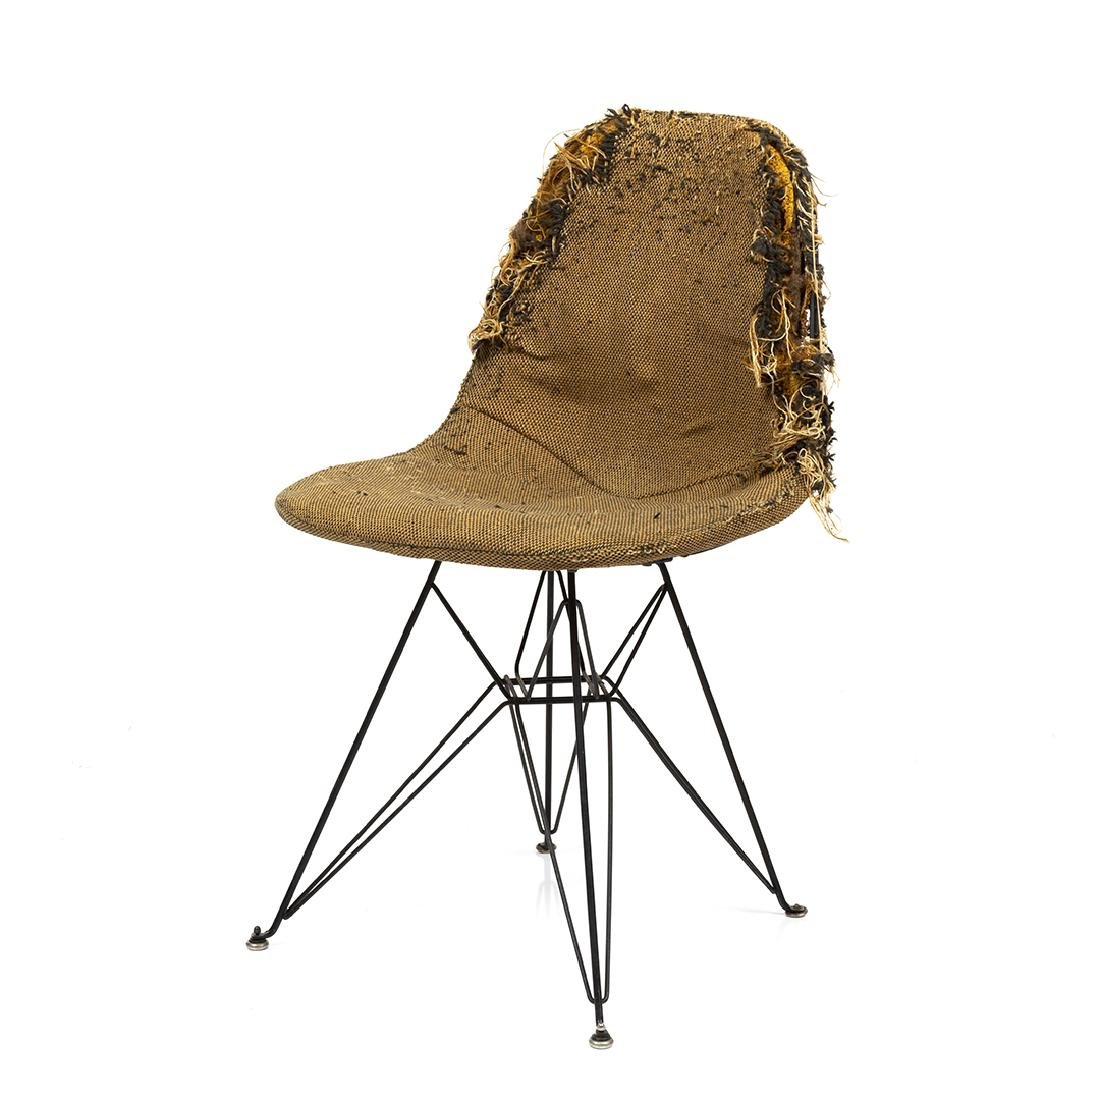 Charles Eames Sideshell Chair